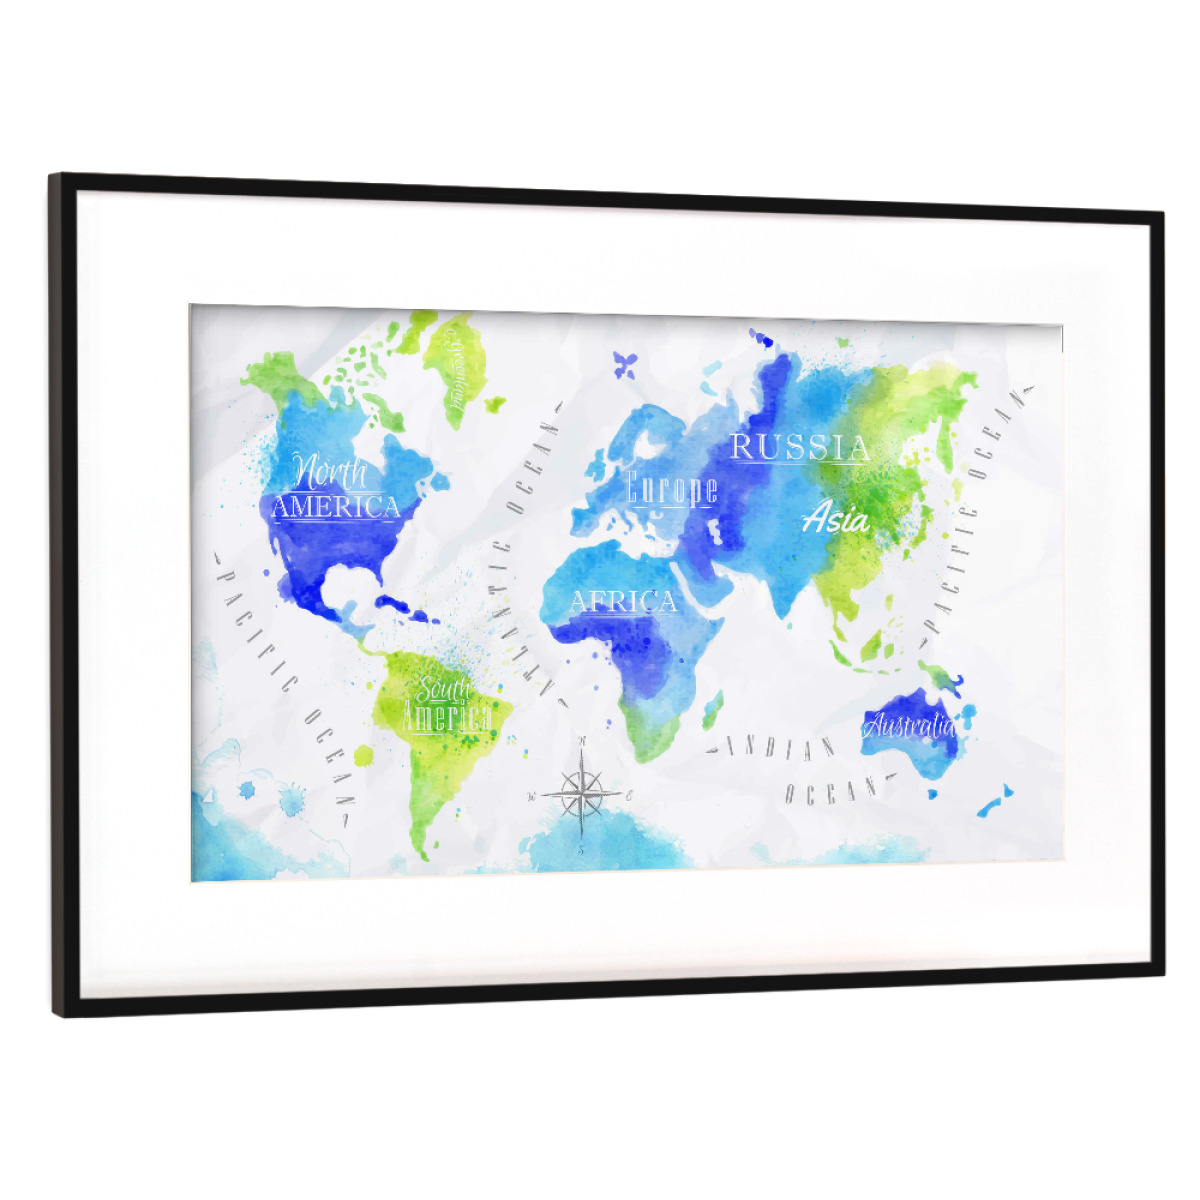 Aquarell Weltkarte Grün Blau Als Gerahmt Bei Artboxone Kaufen